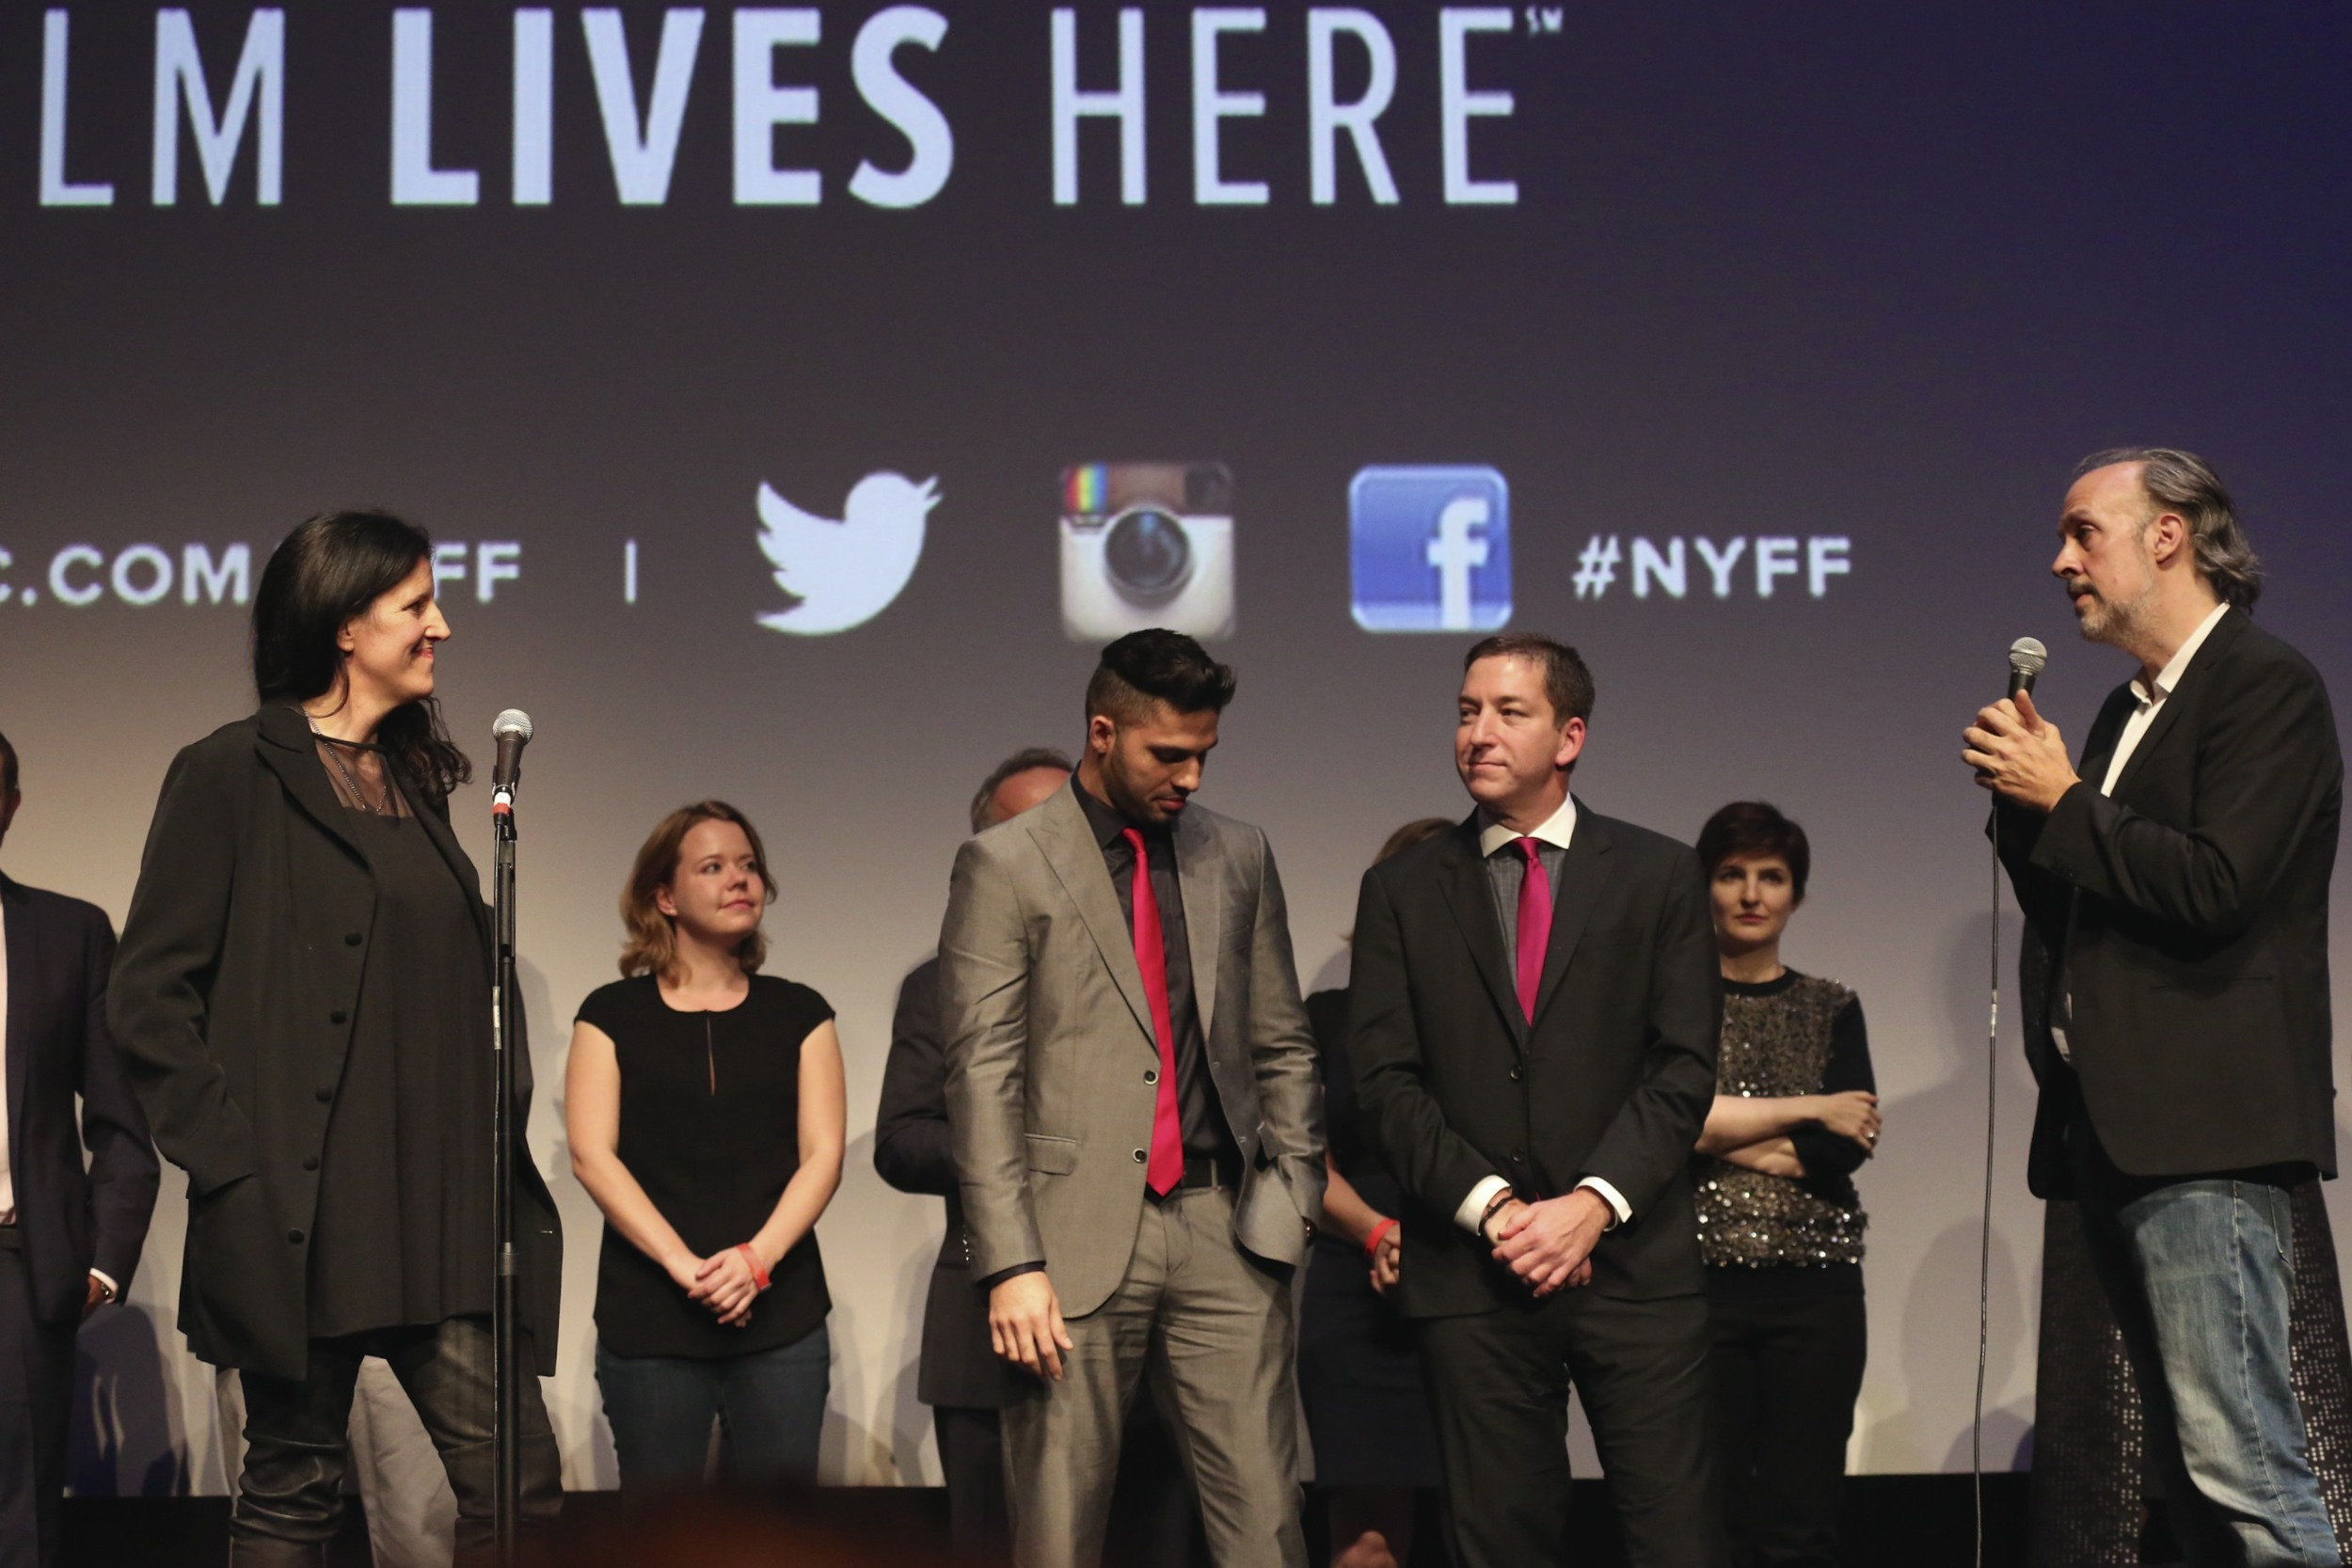 Laura Poitras, David Miranda, Glenn Greenwald, Kent Jones